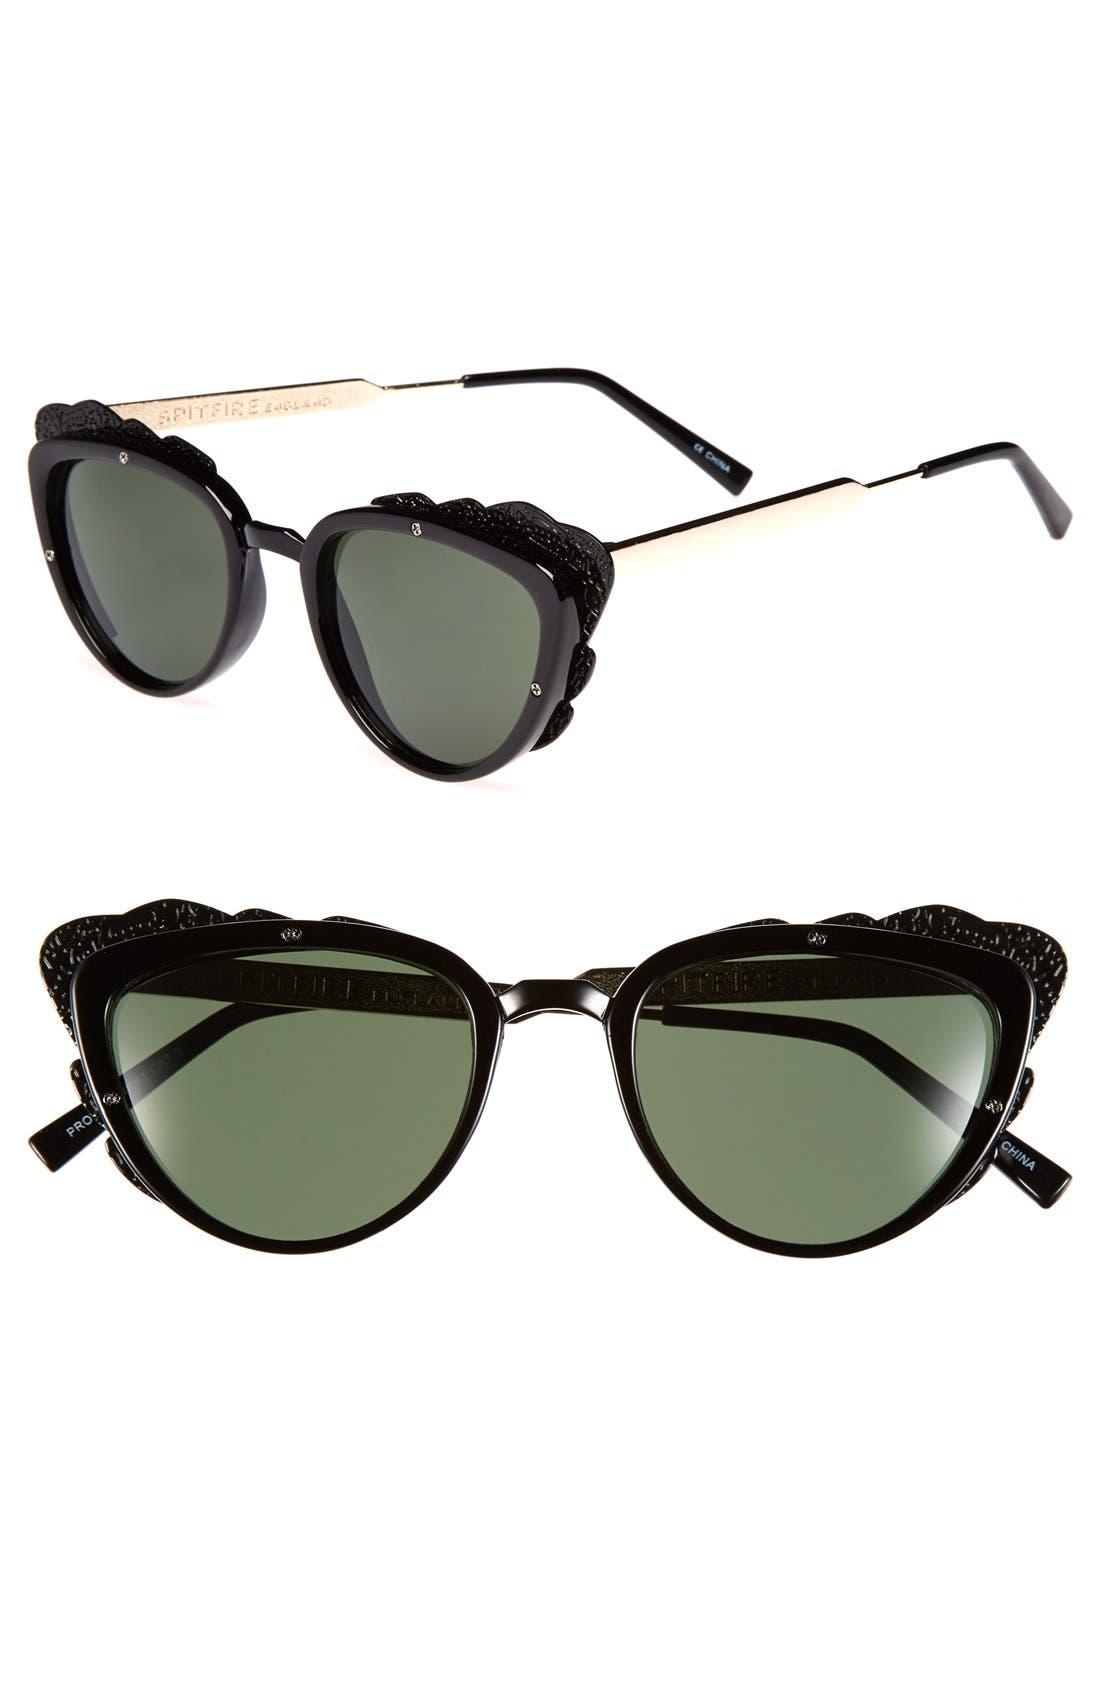 Main Image - Spitfire 48mm Cat Eye Sunglasses